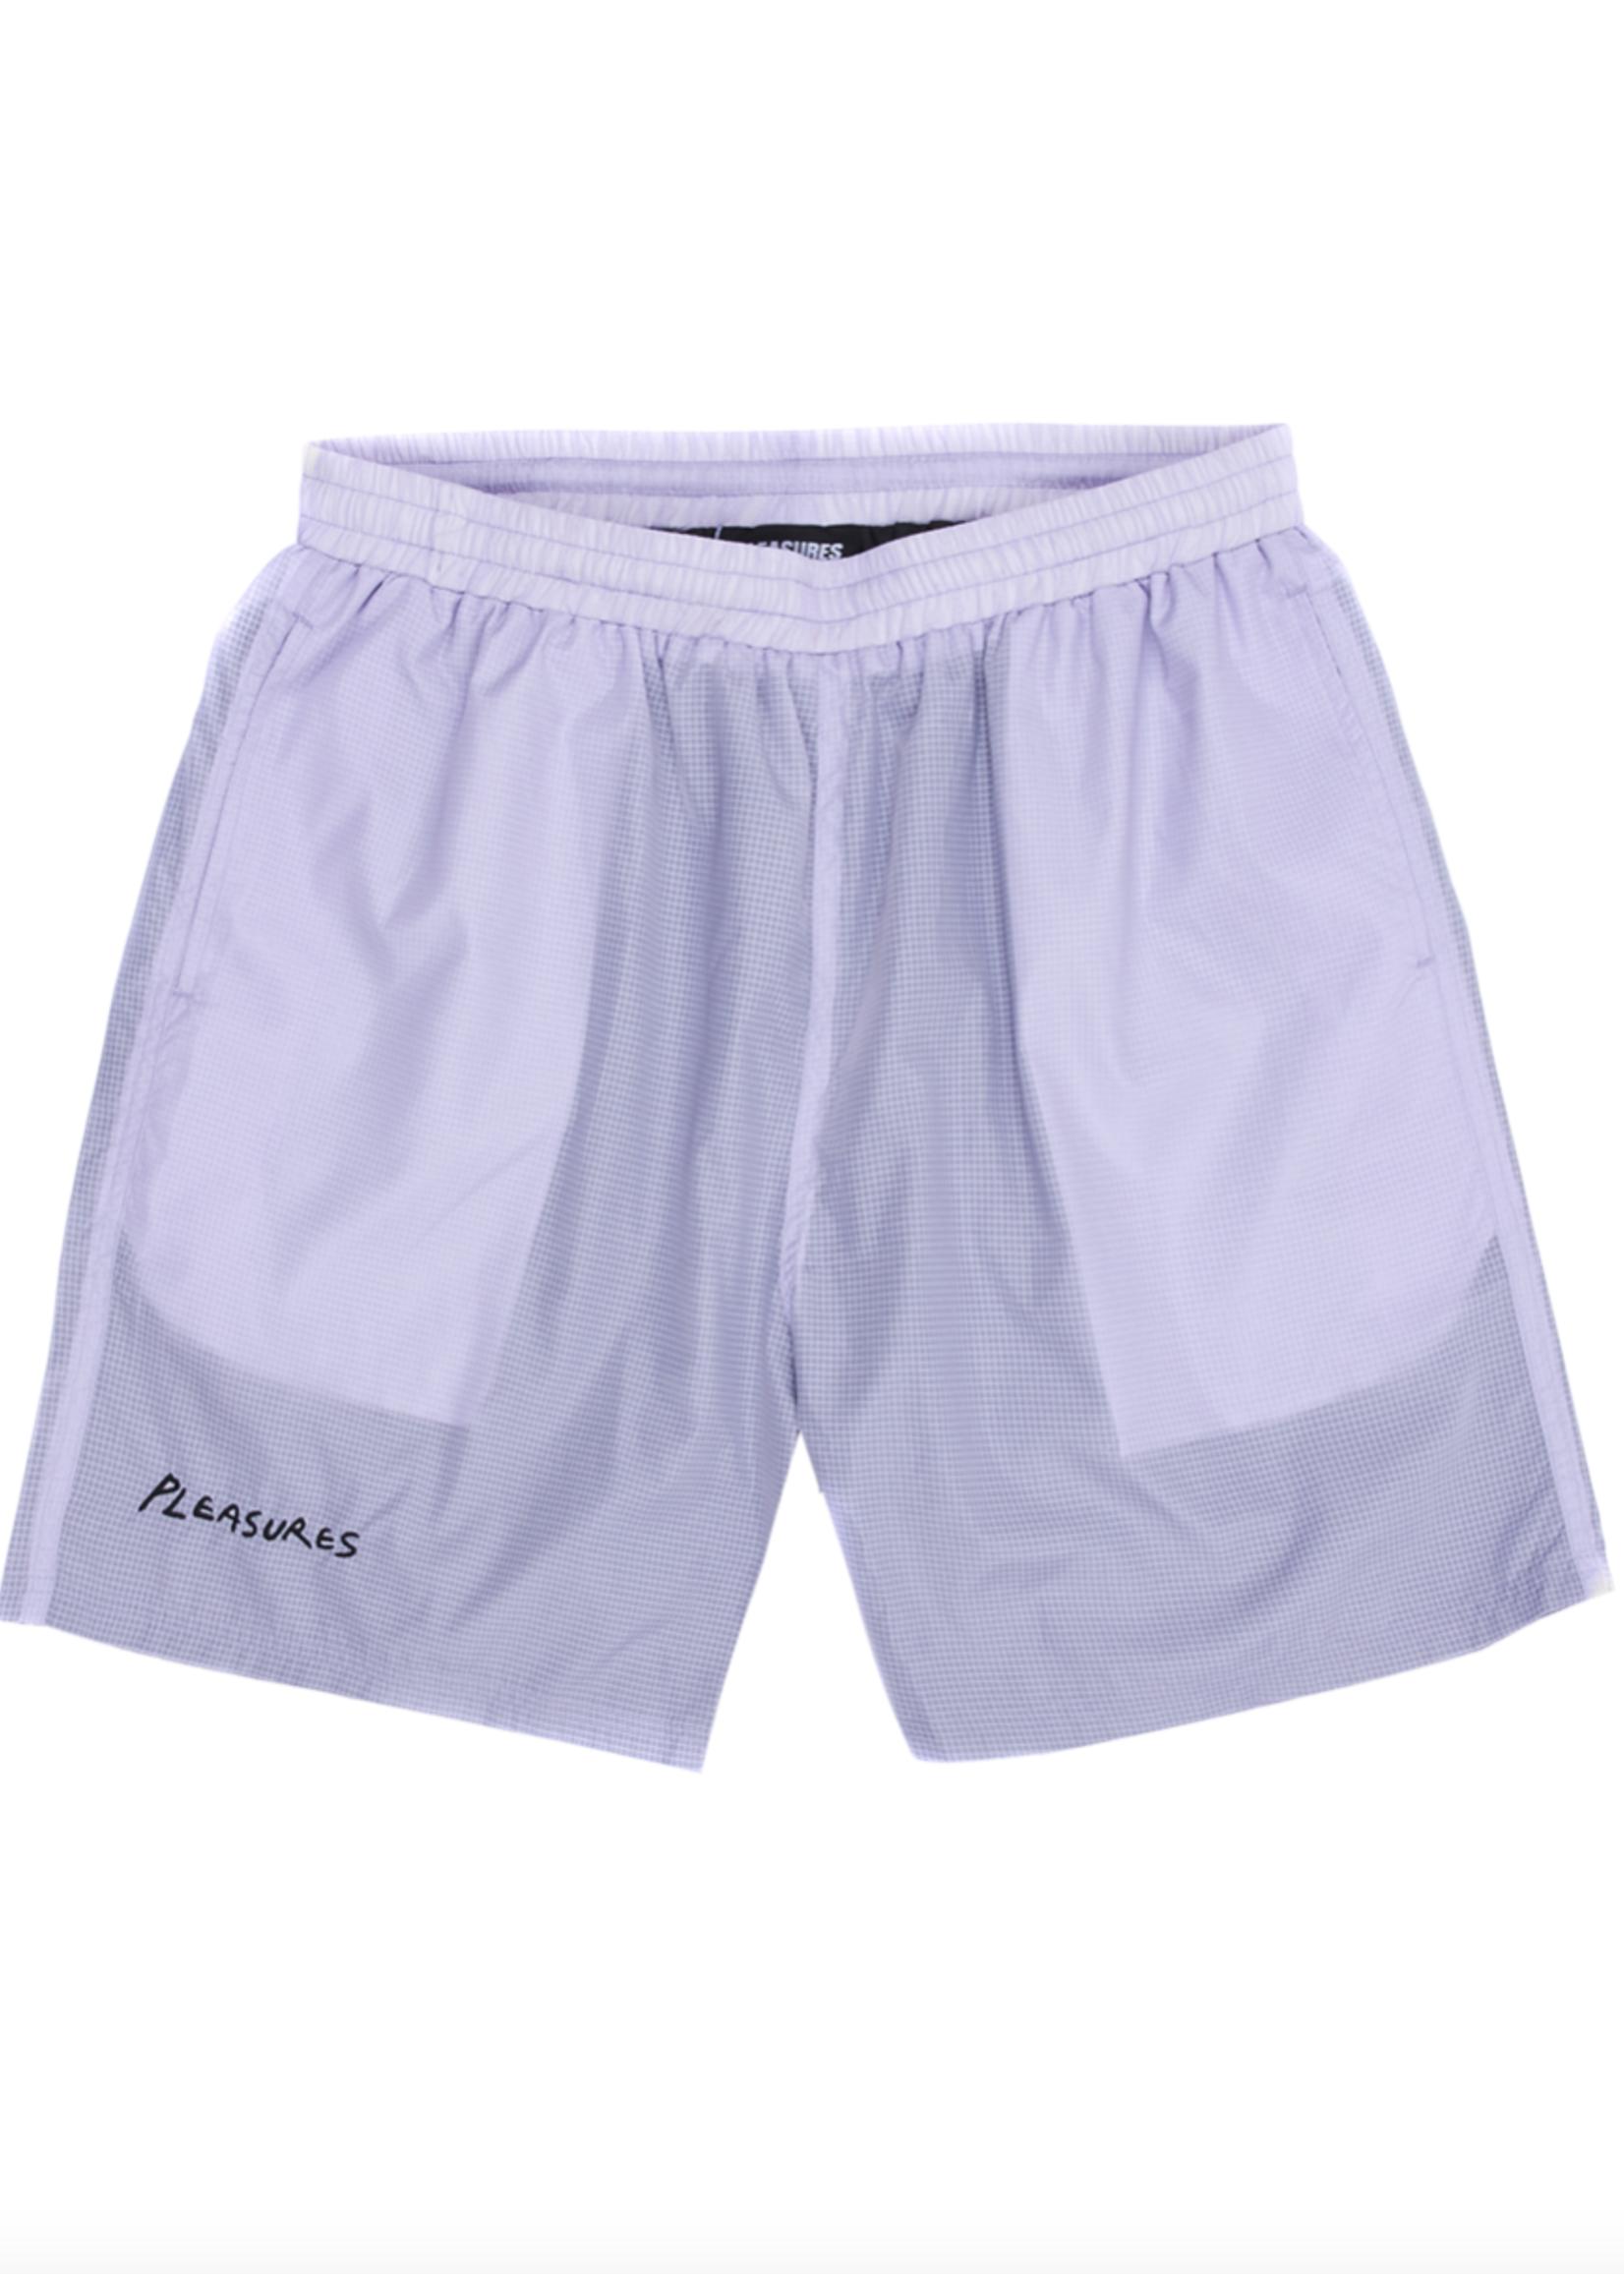 PLEASURES VCR Active Nylon Shorts in Lavender